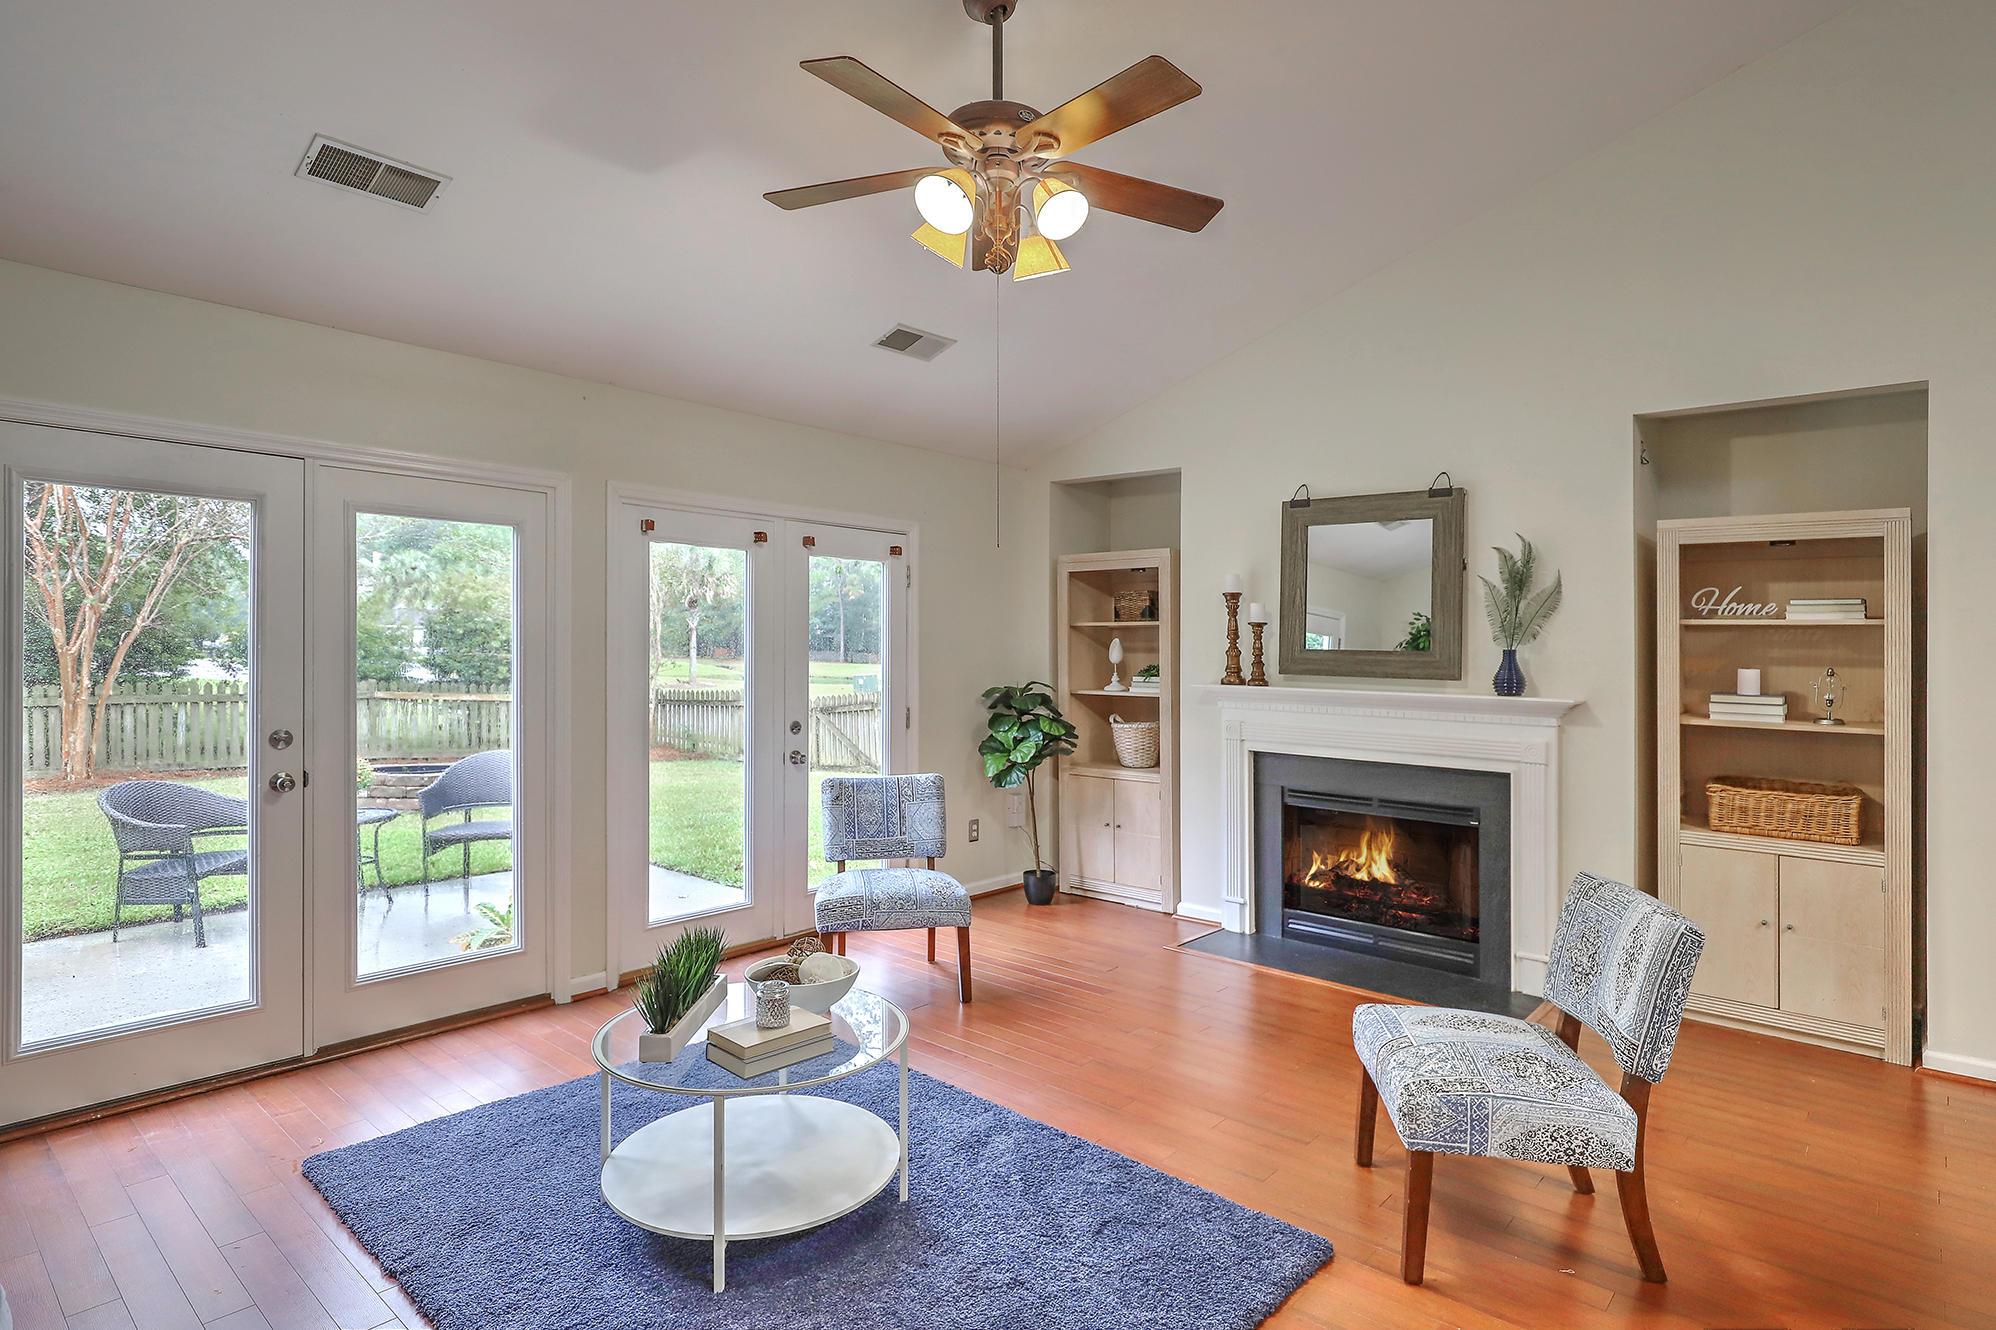 Planters Pointe Homes For Sale - 2951 Loebs, Mount Pleasant, SC - 15